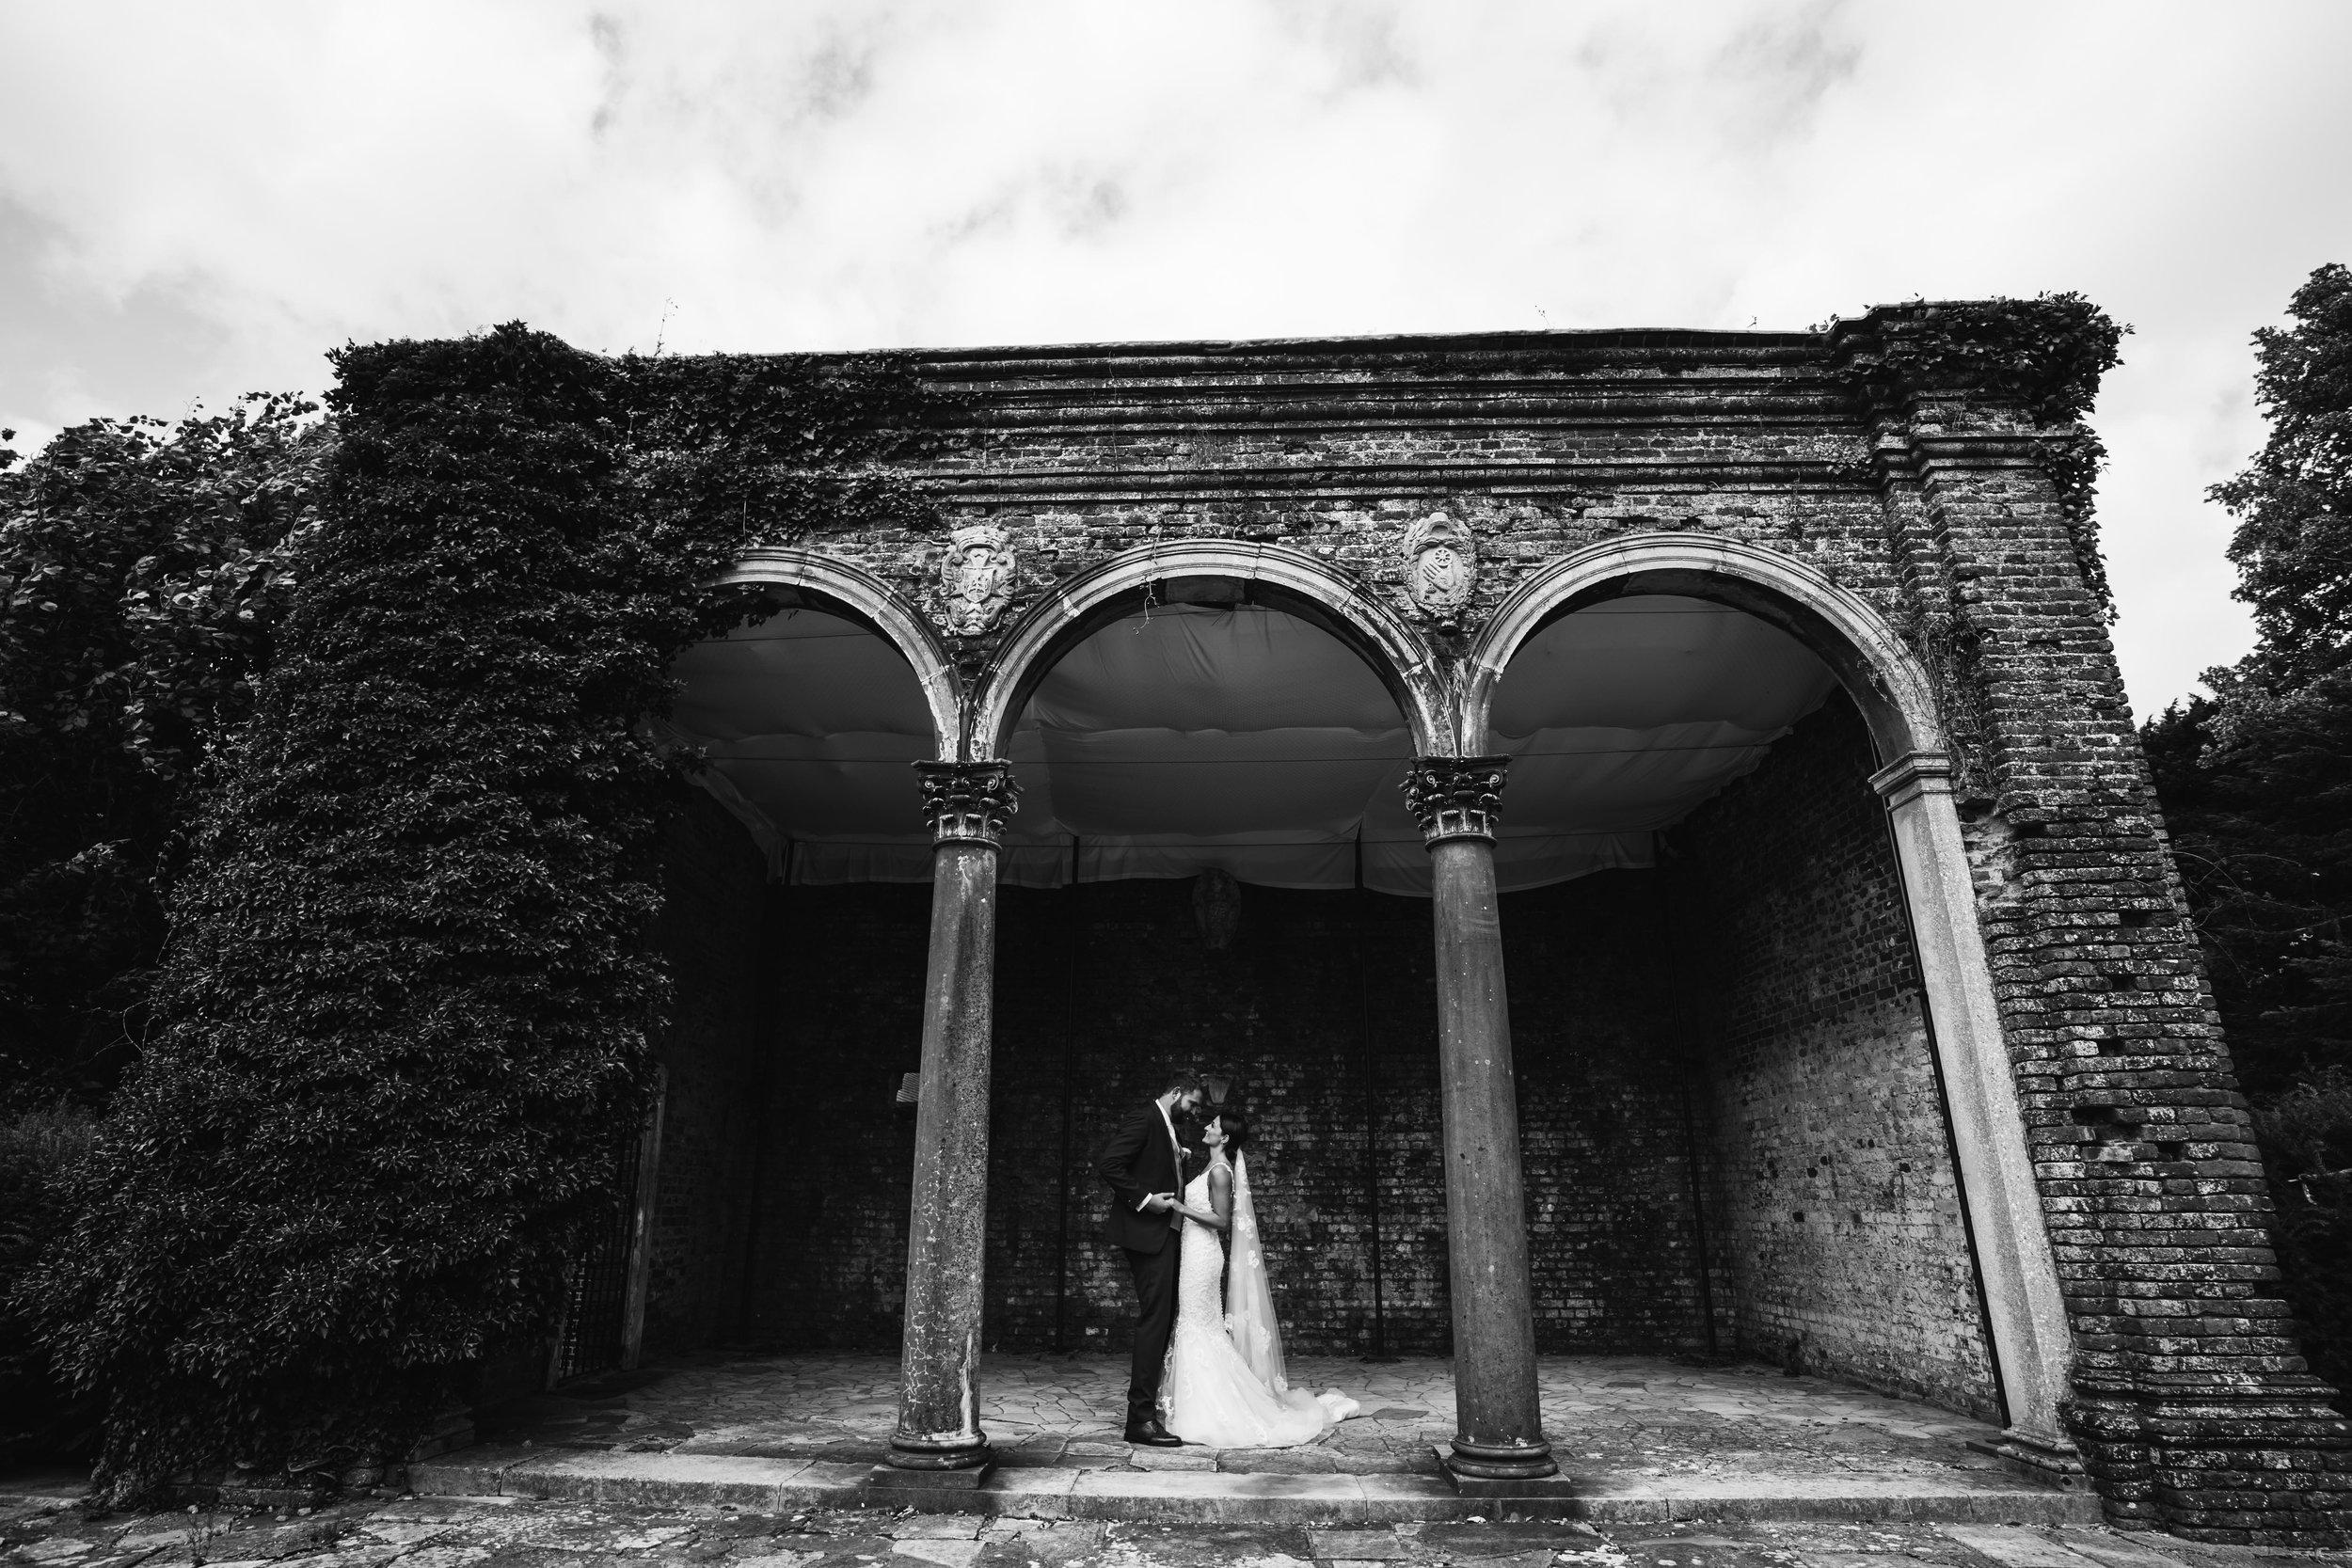 kent-wedding-photographer-104812.jpg